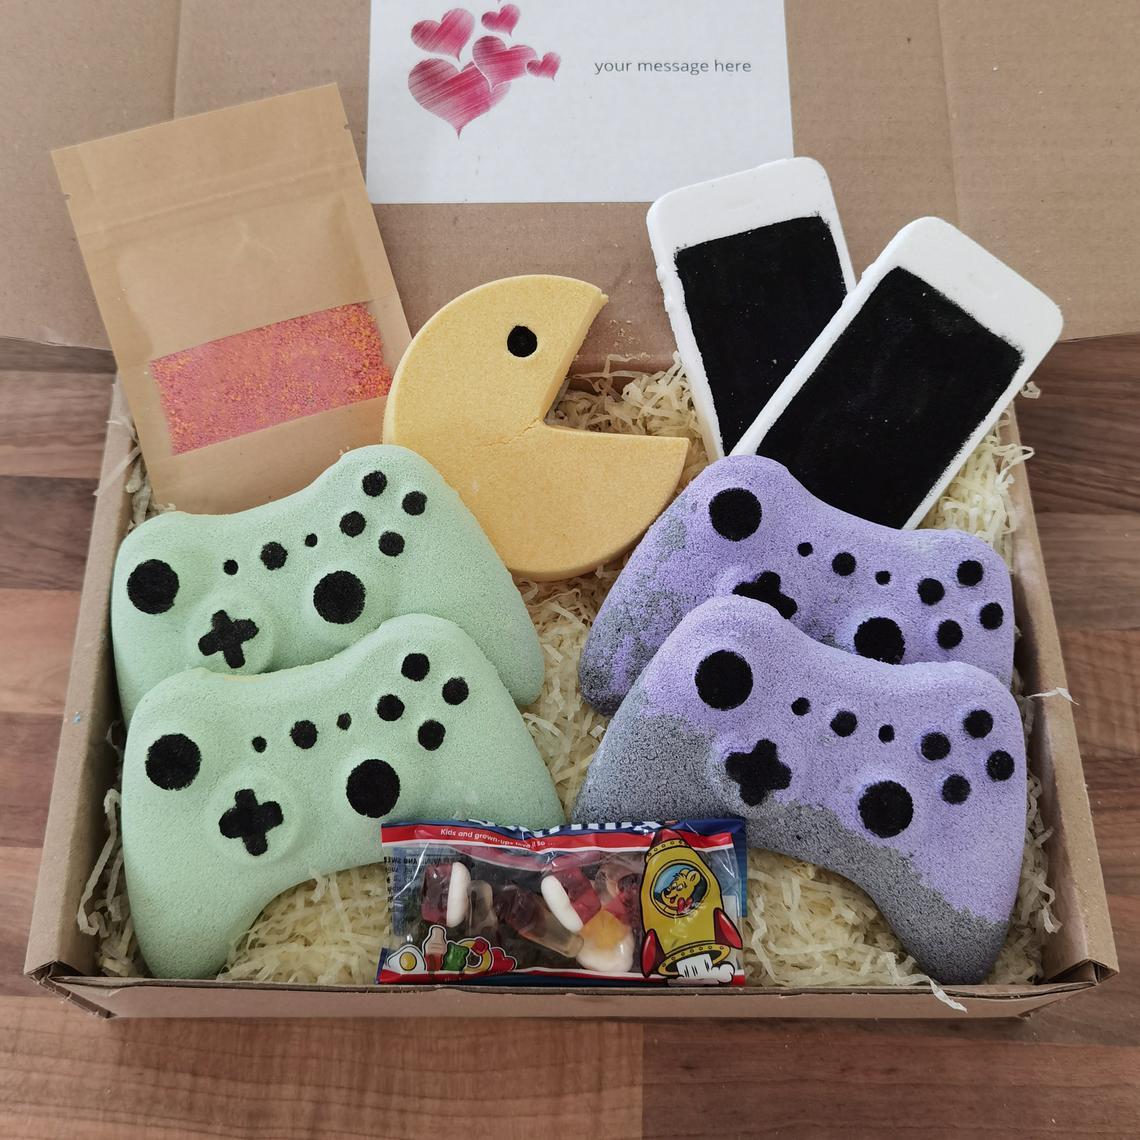 VBeautyCosmetic on Etsy: Controller Bath Bomb, Gamer, Bath Fizz, Vegan, Cruelty Free, Bath Fizzer, Bath Bomb Gift Set